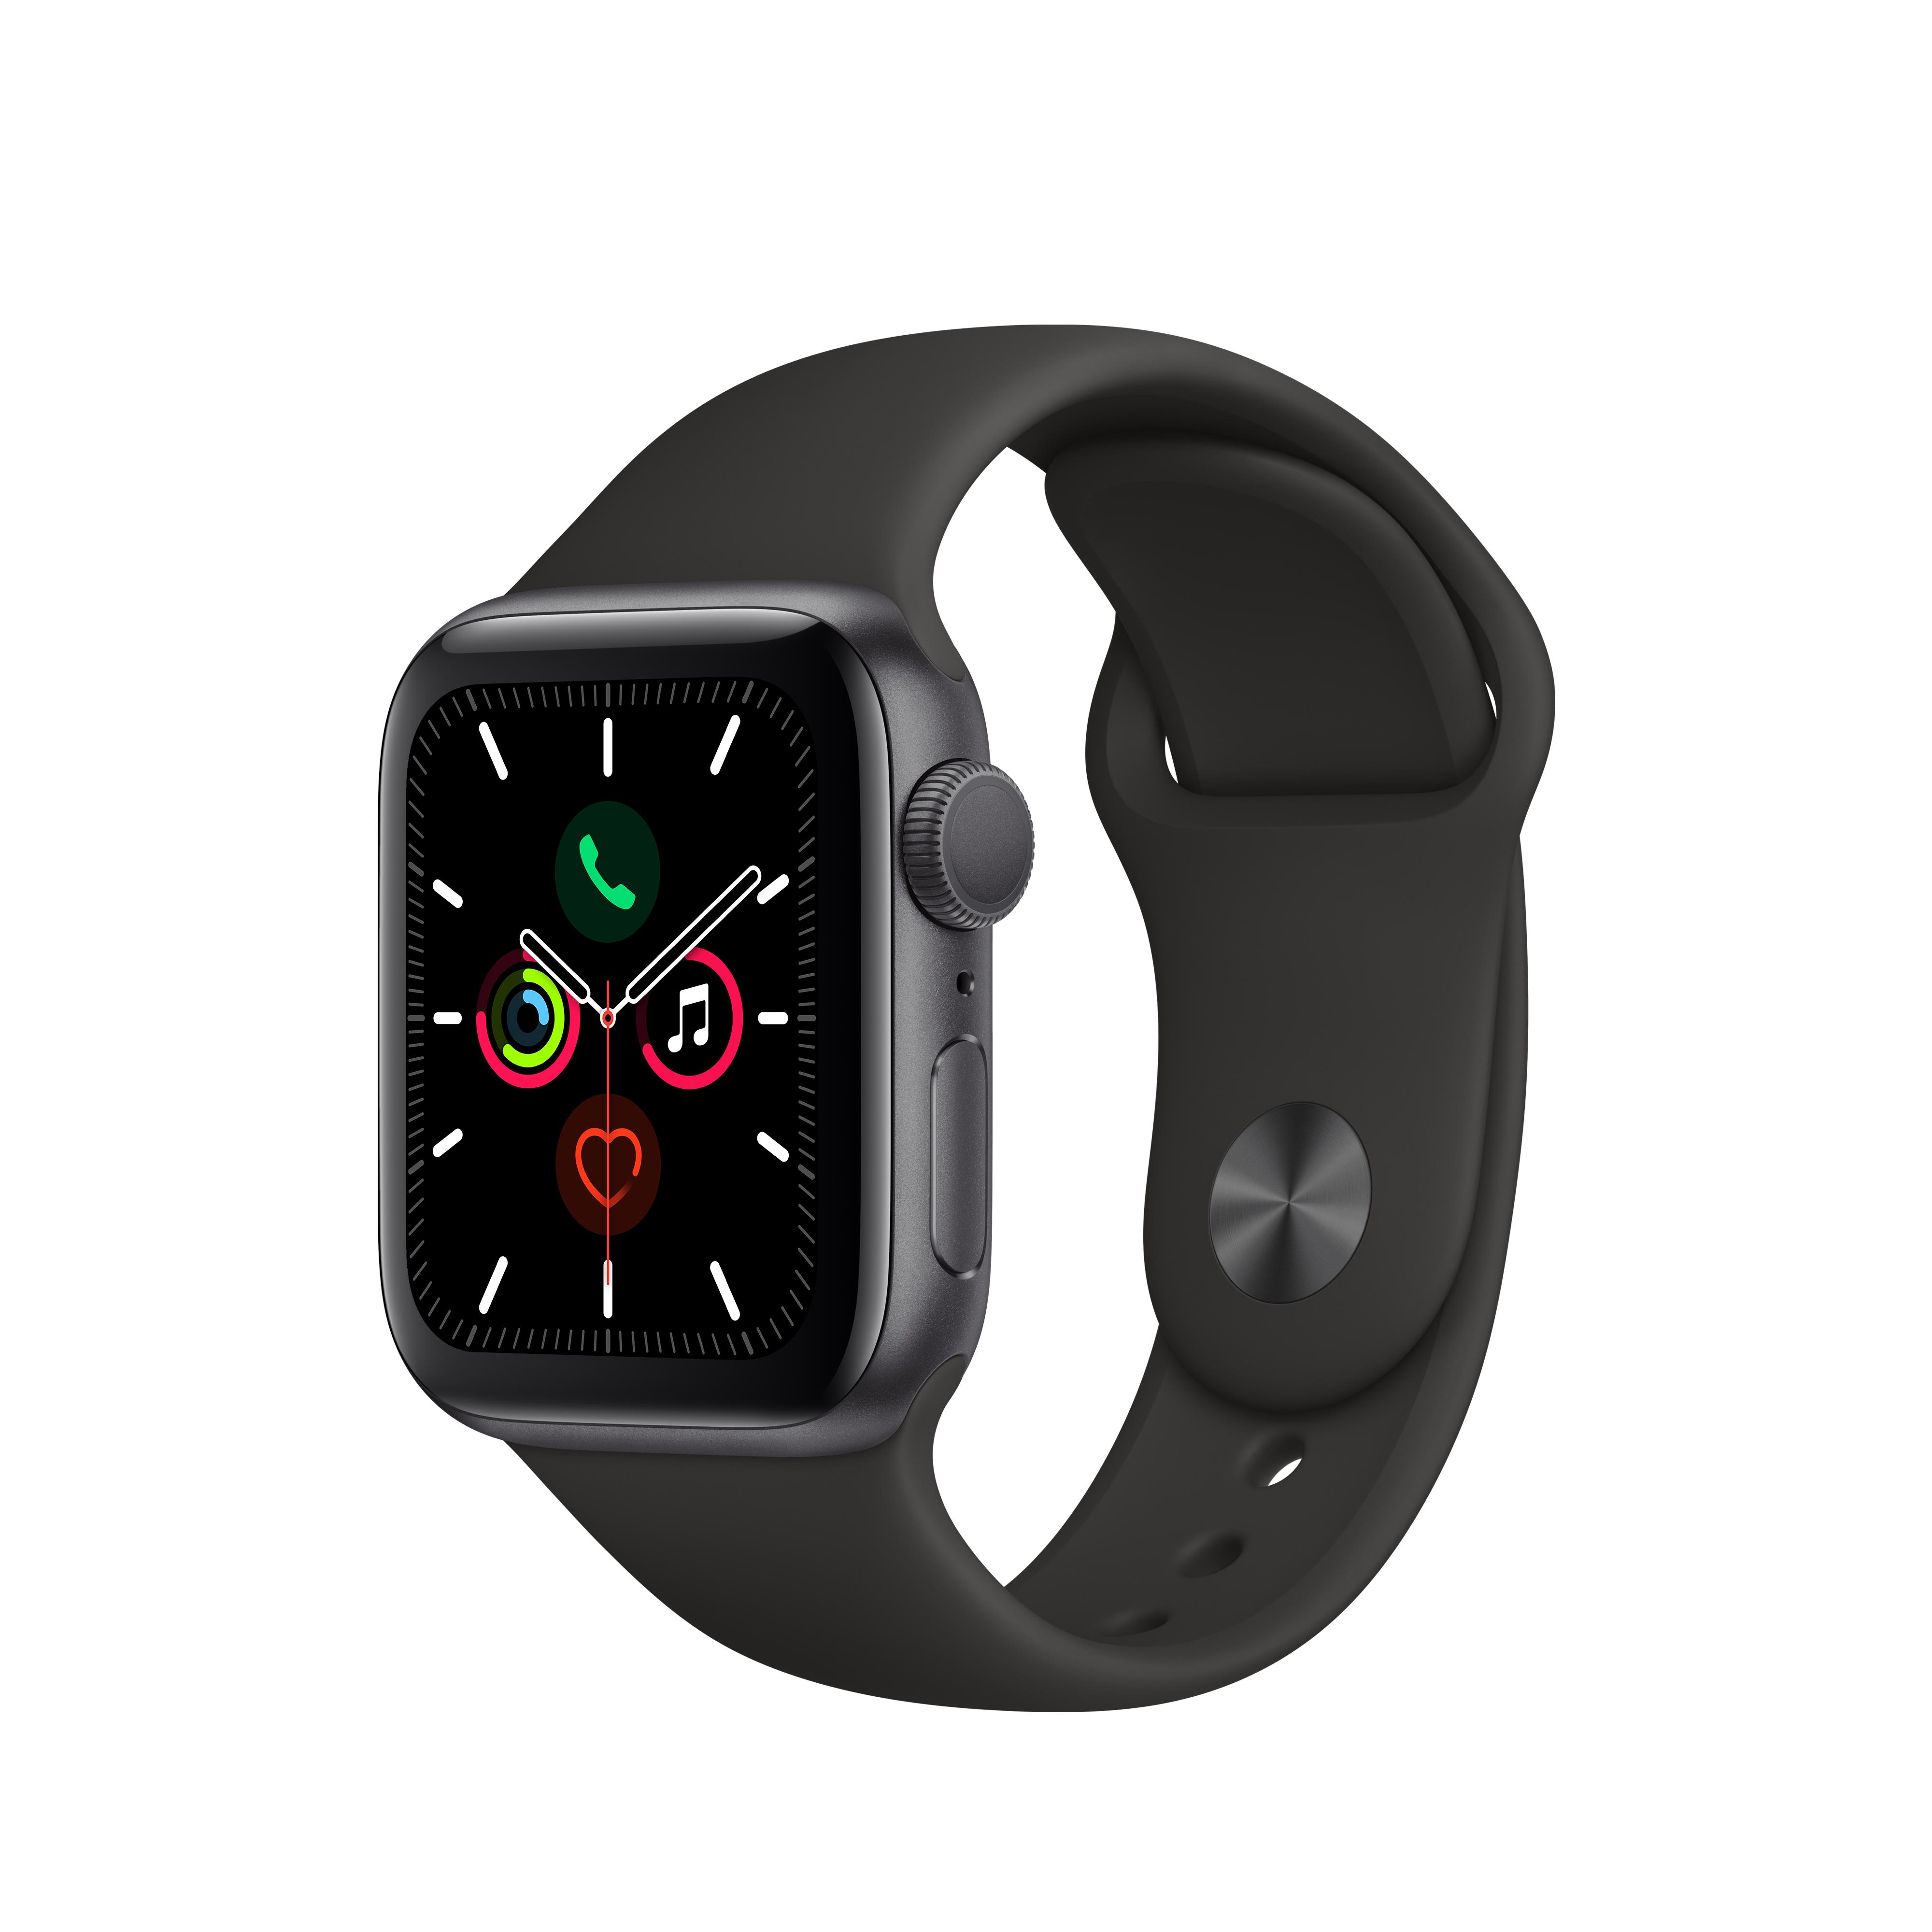 Apple 애플워치5 GPS 40mm 스포츠밴드 + 알루미늄케이스, 스페이스 그레이(MWV82KH/A), 블랙(밴드)